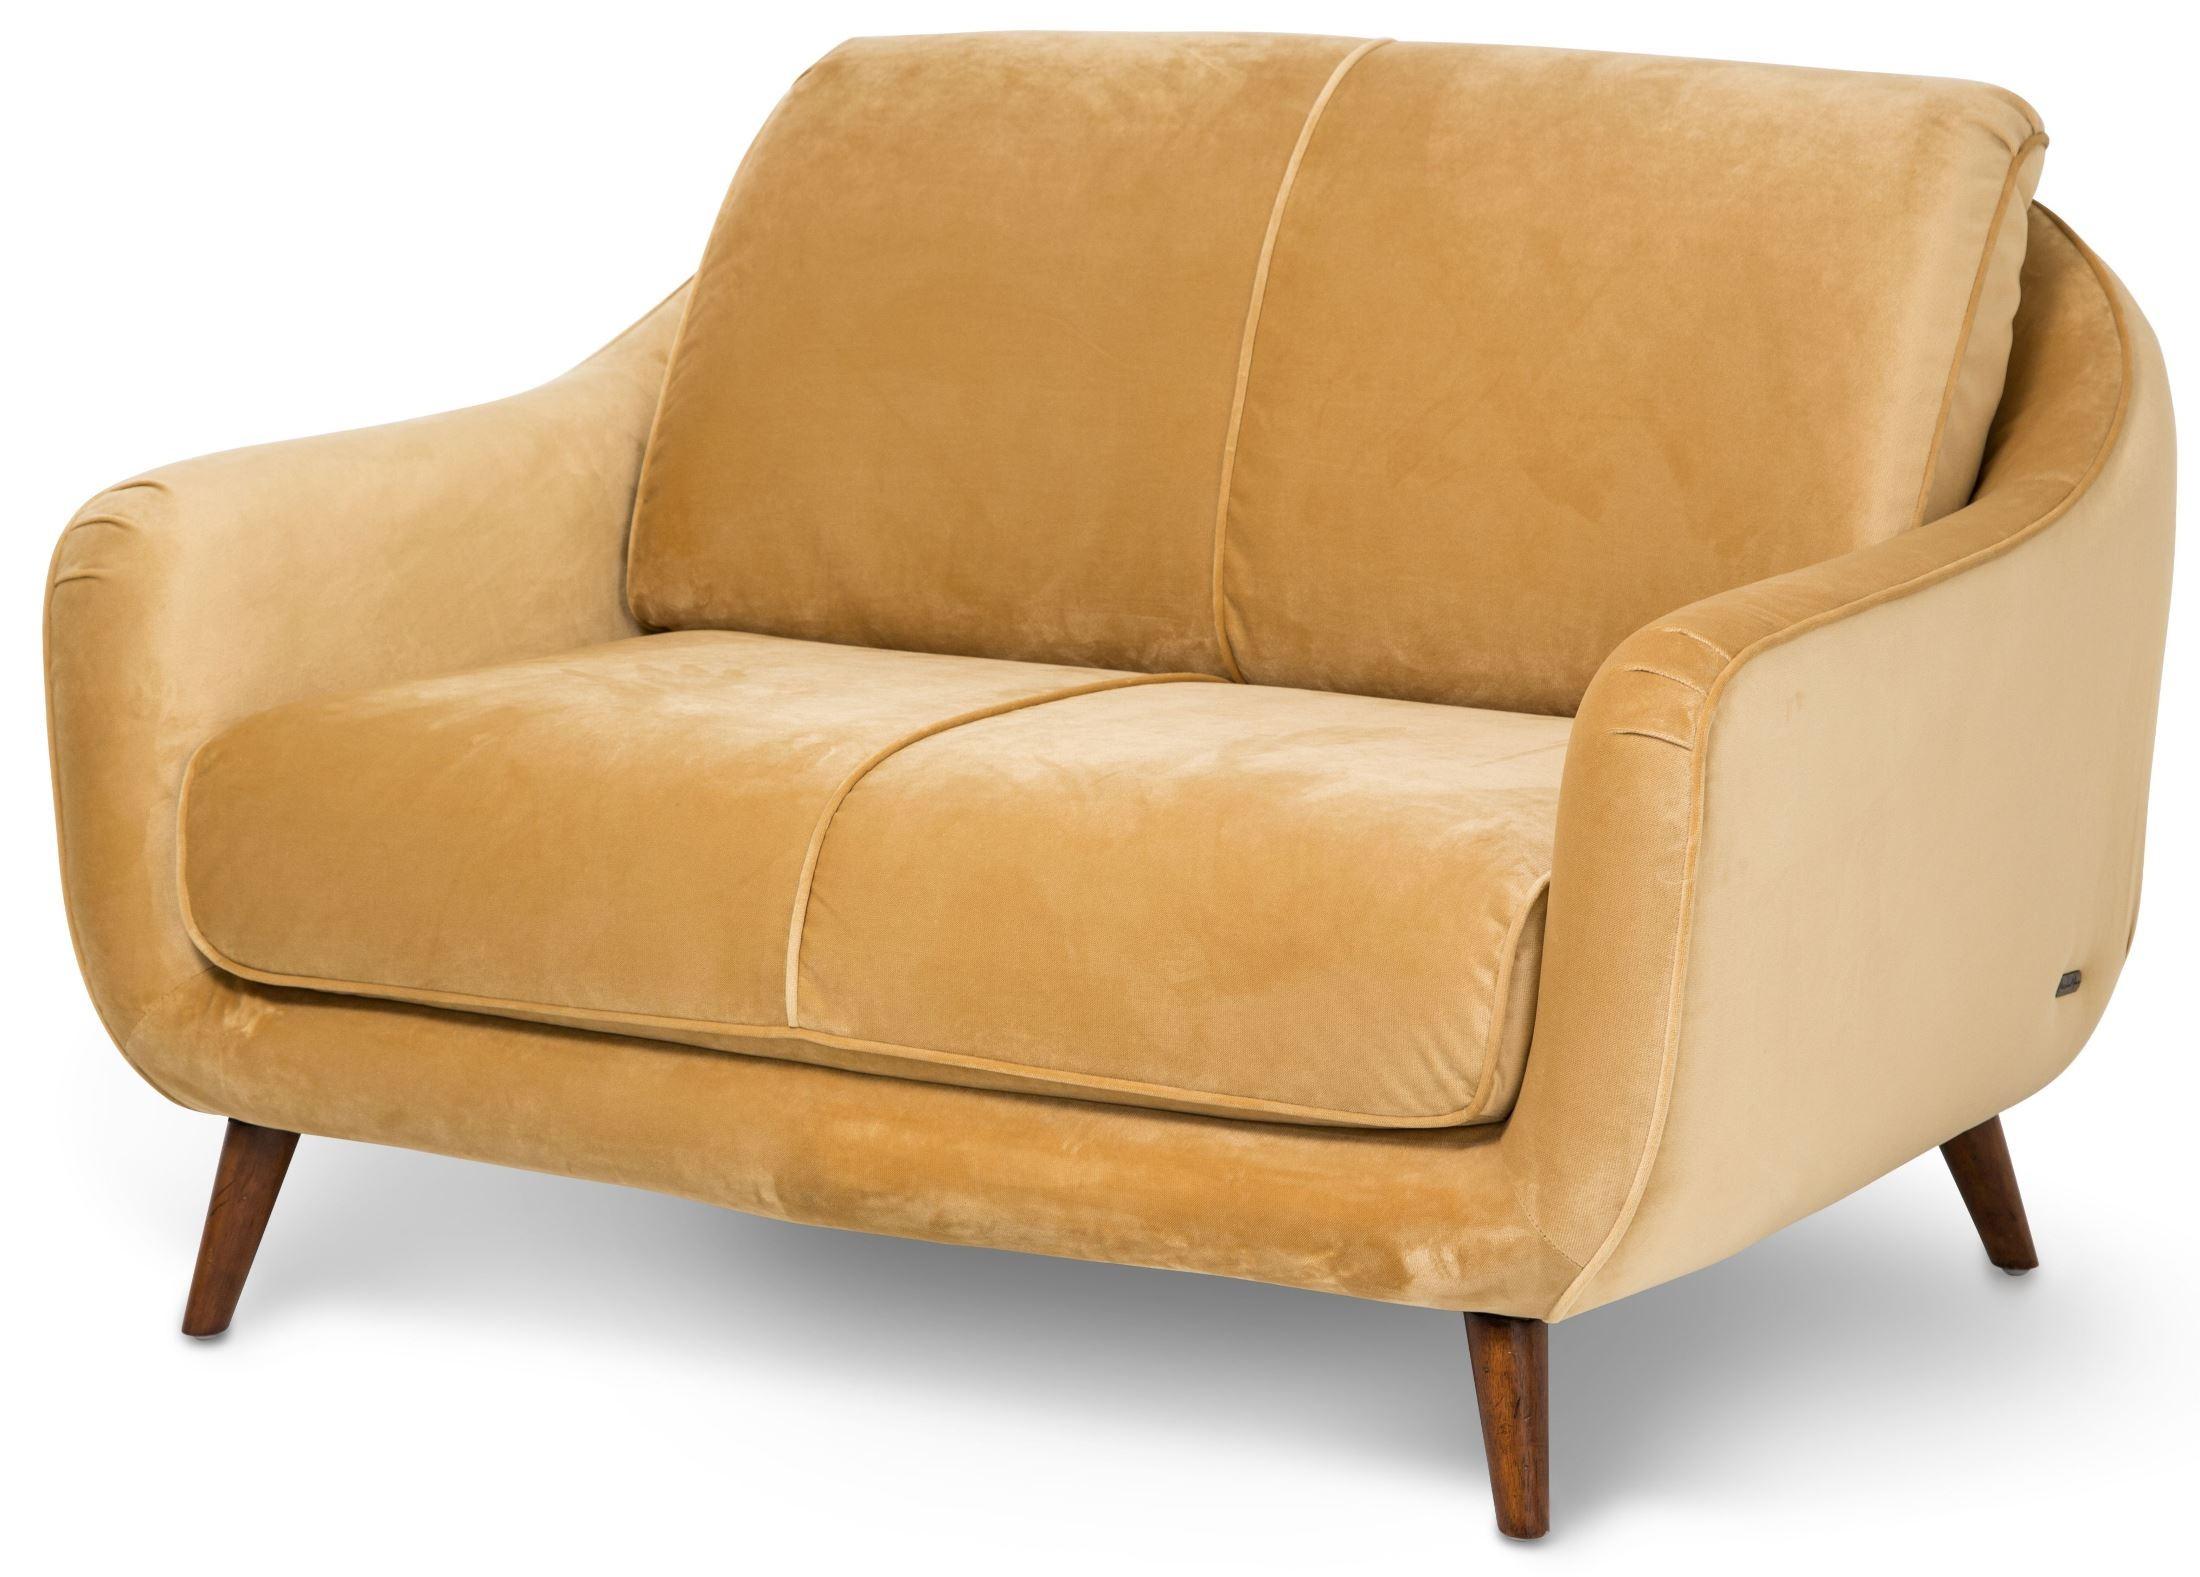 Studio Brussels Gold Upholstered Loveseat St Brusl25 Sun 45 Aico